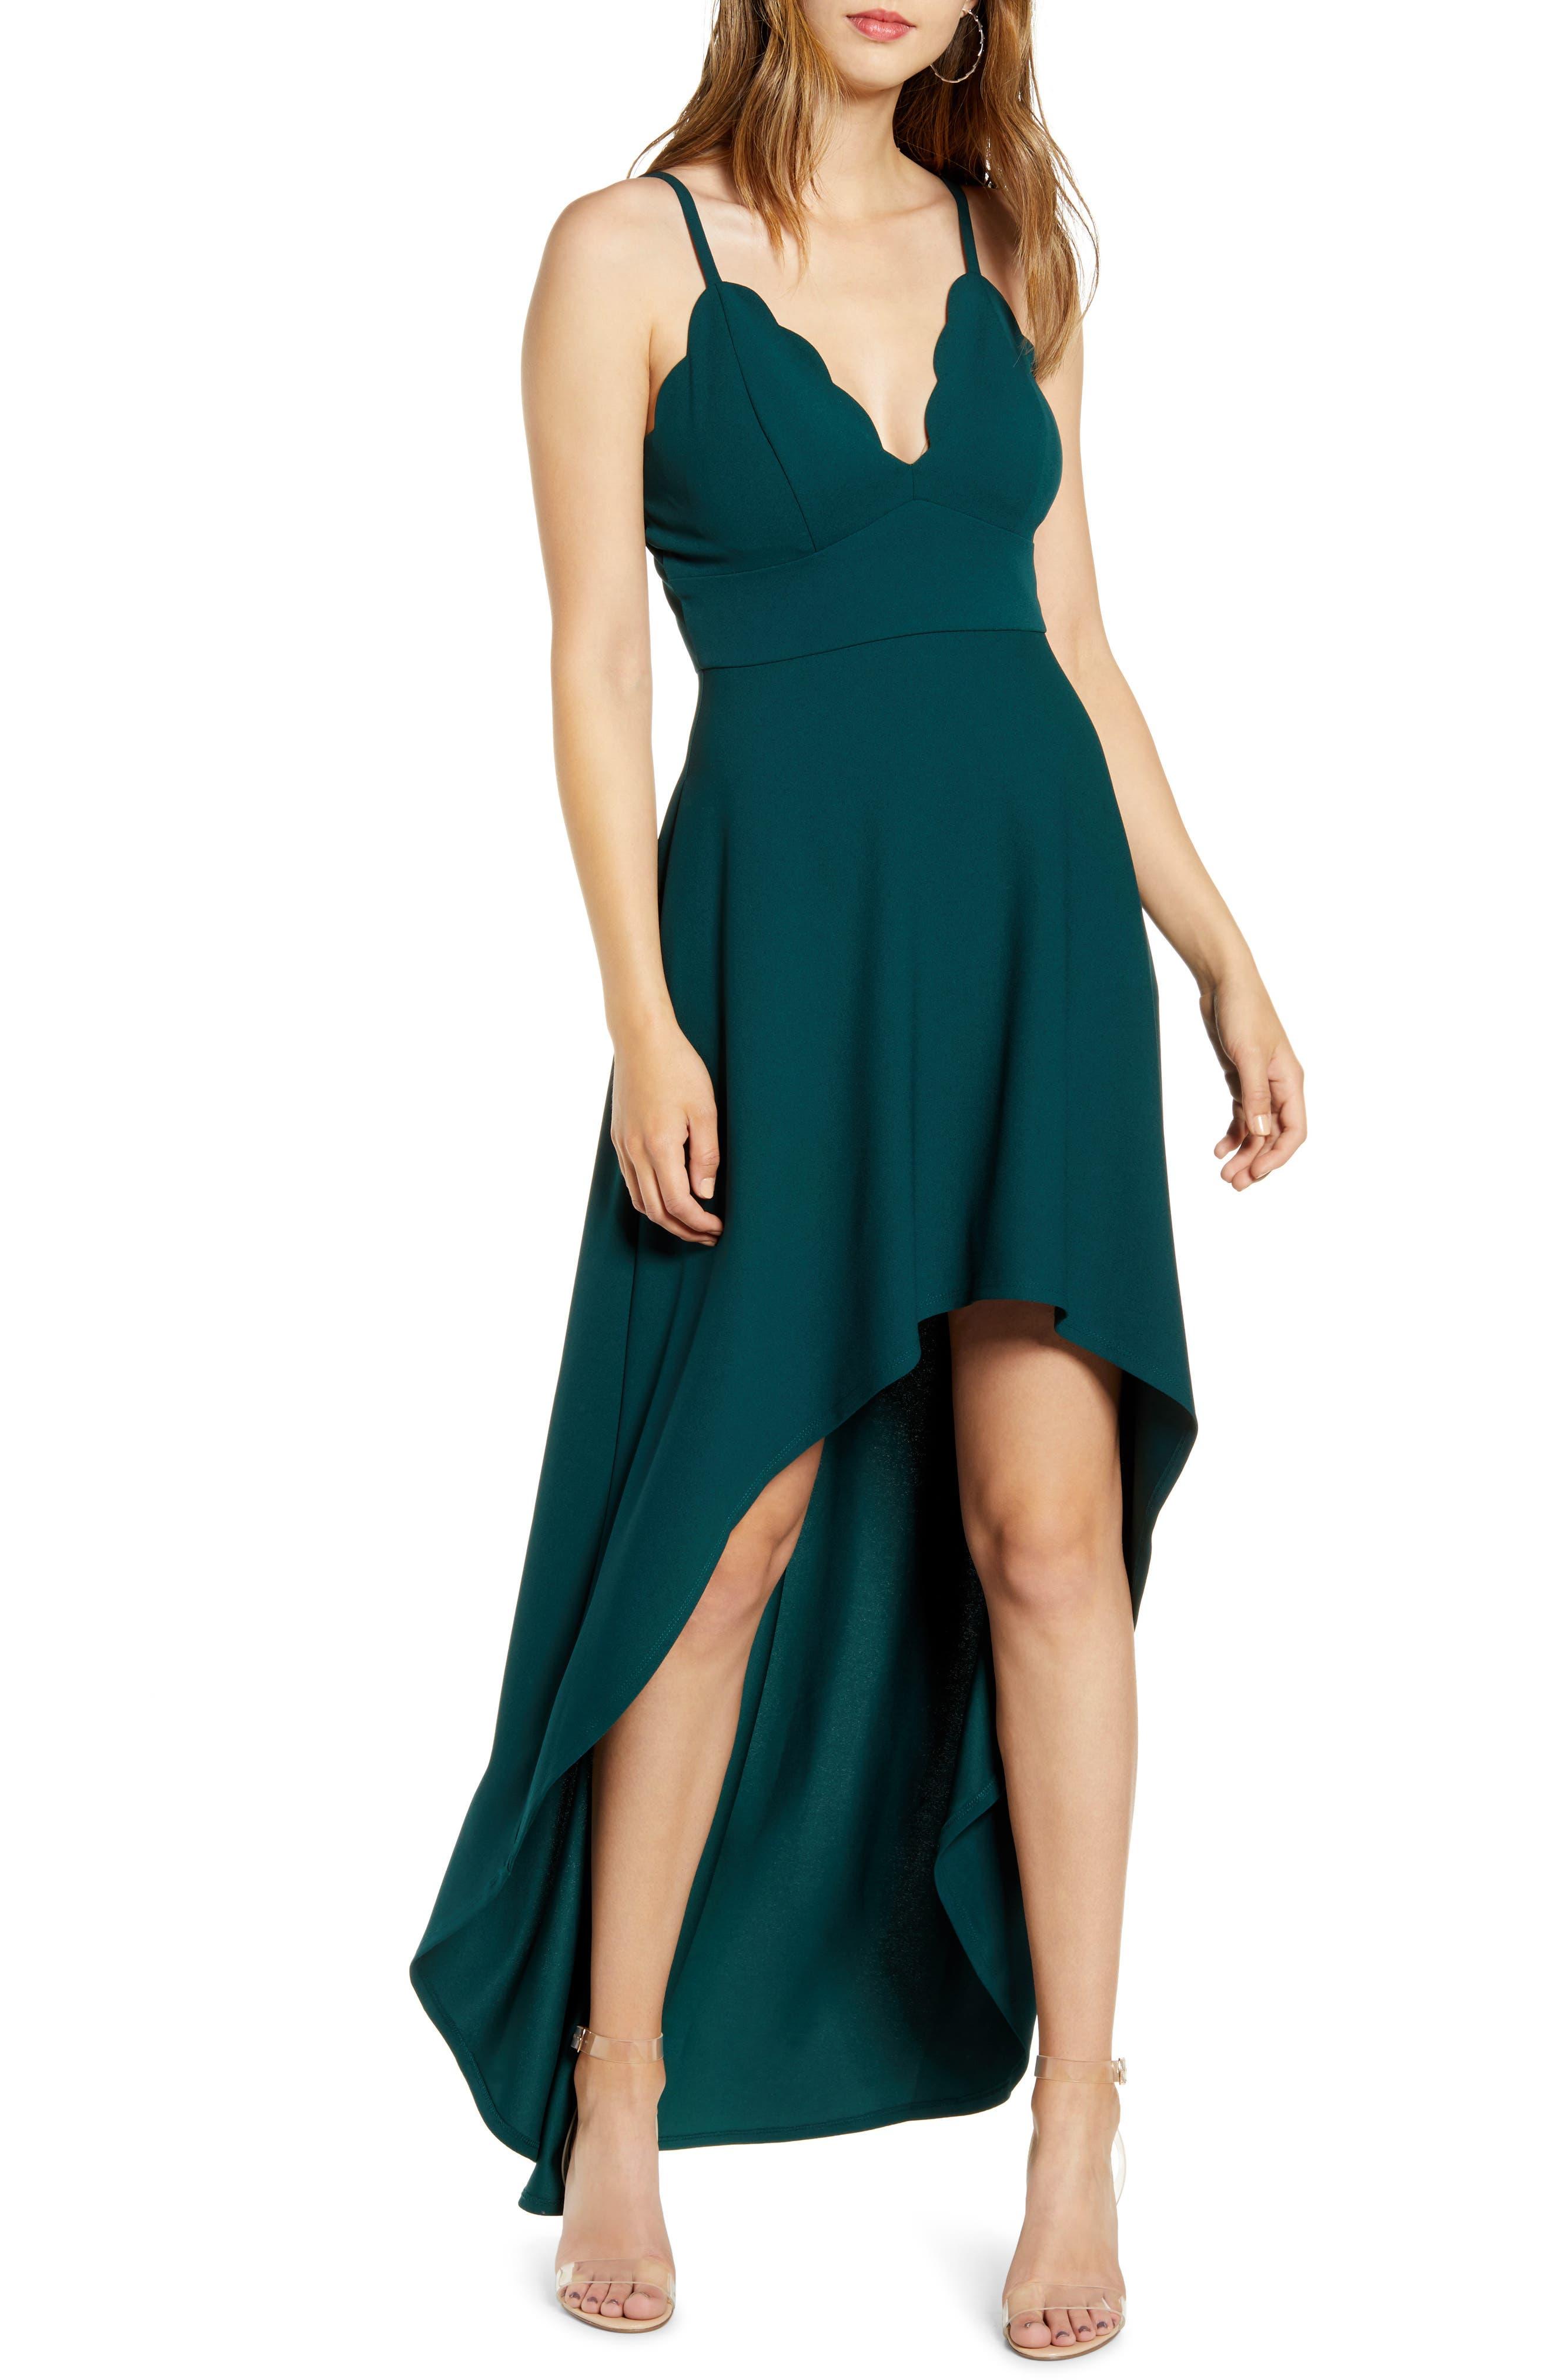 Speechless Scallop Plunge Neck High/low Dress, Green